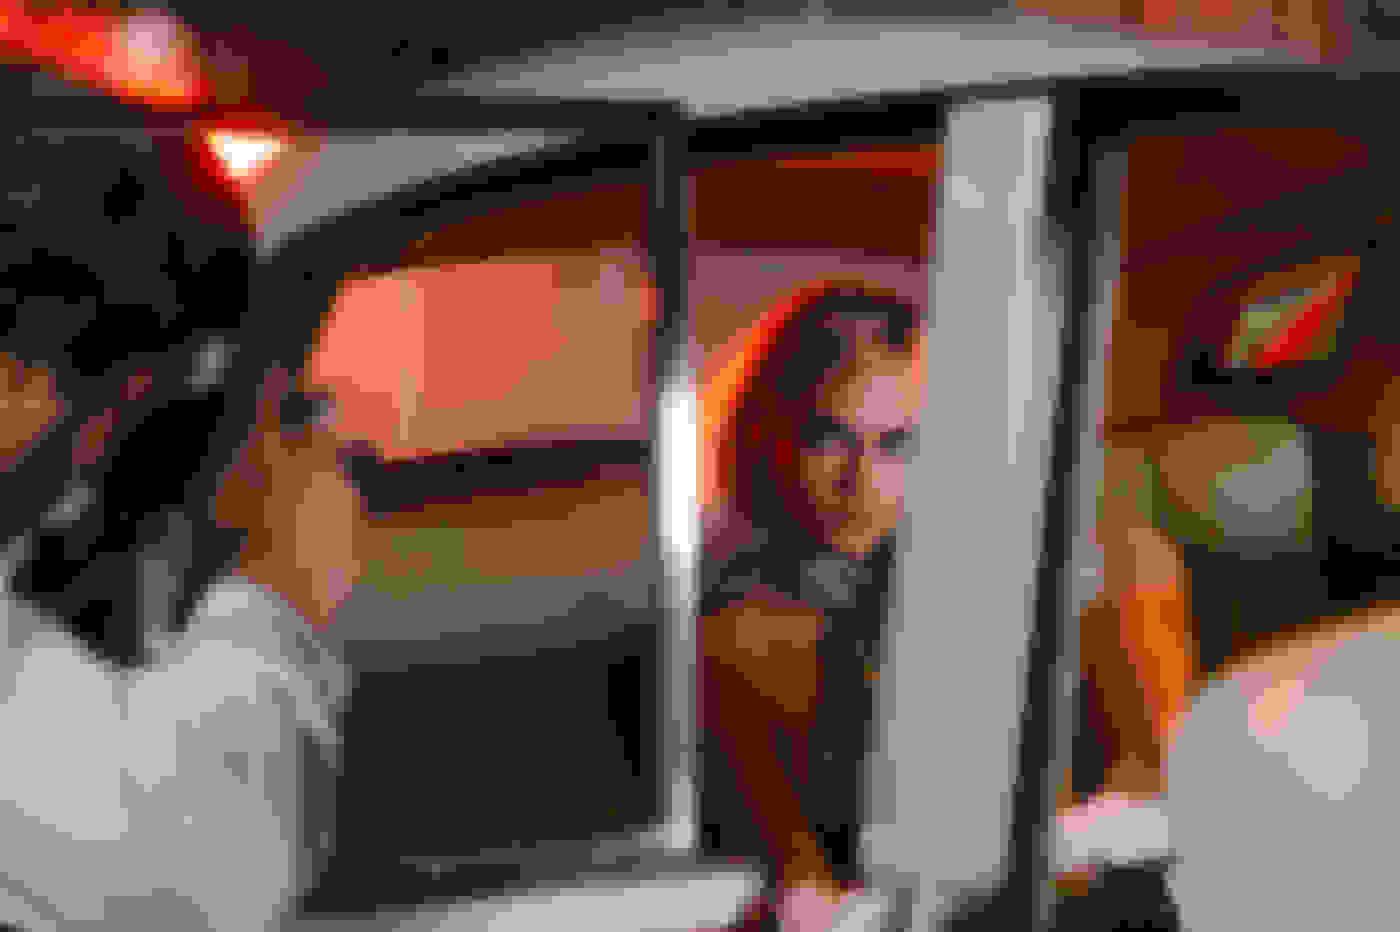 Cara Delevingne in a car